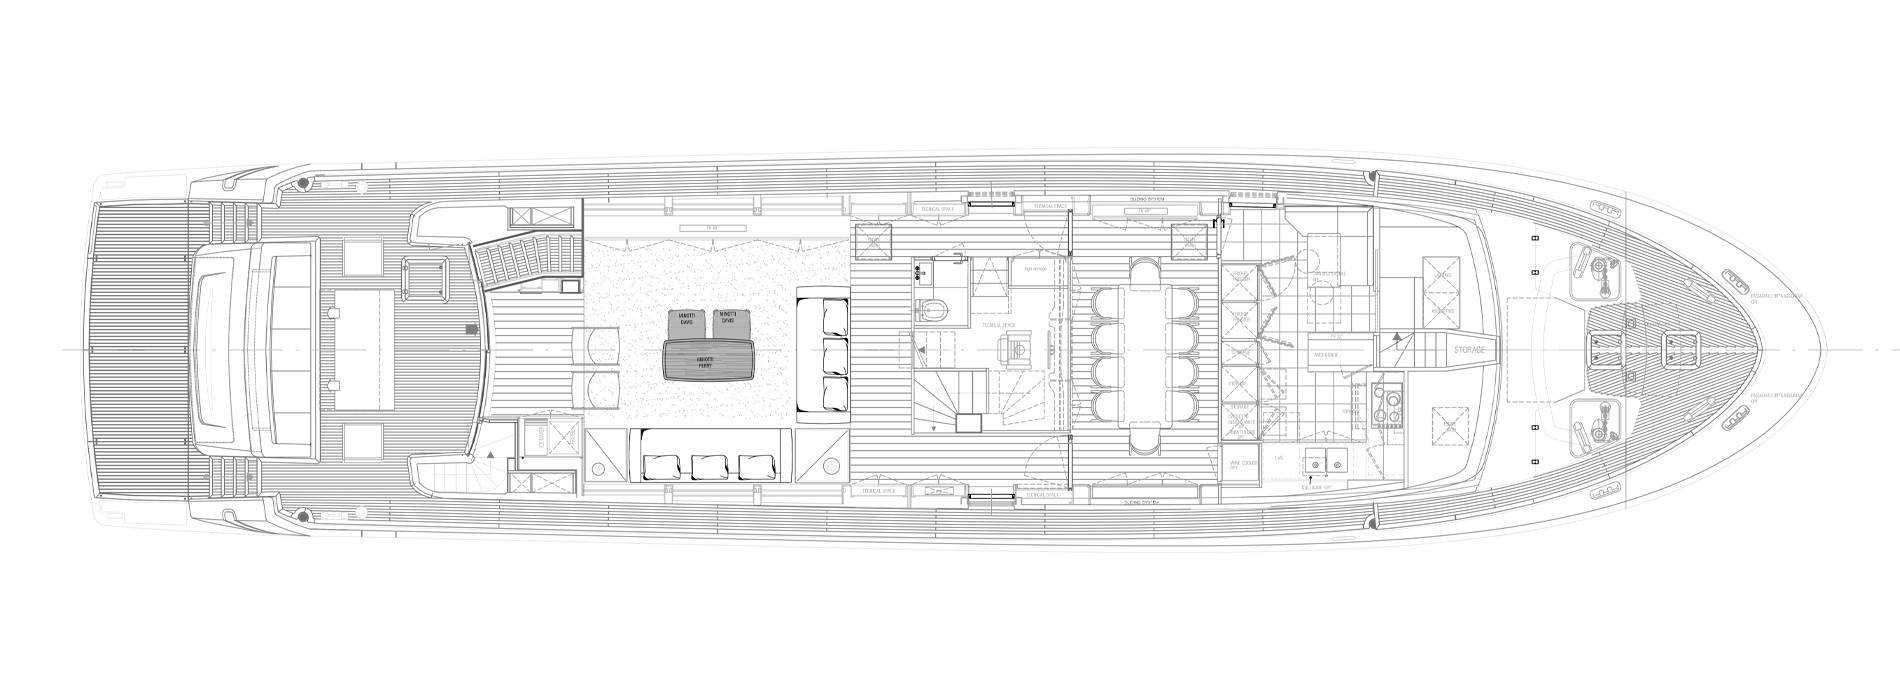 Sanlorenzo Yachts SL96-631 Main deck